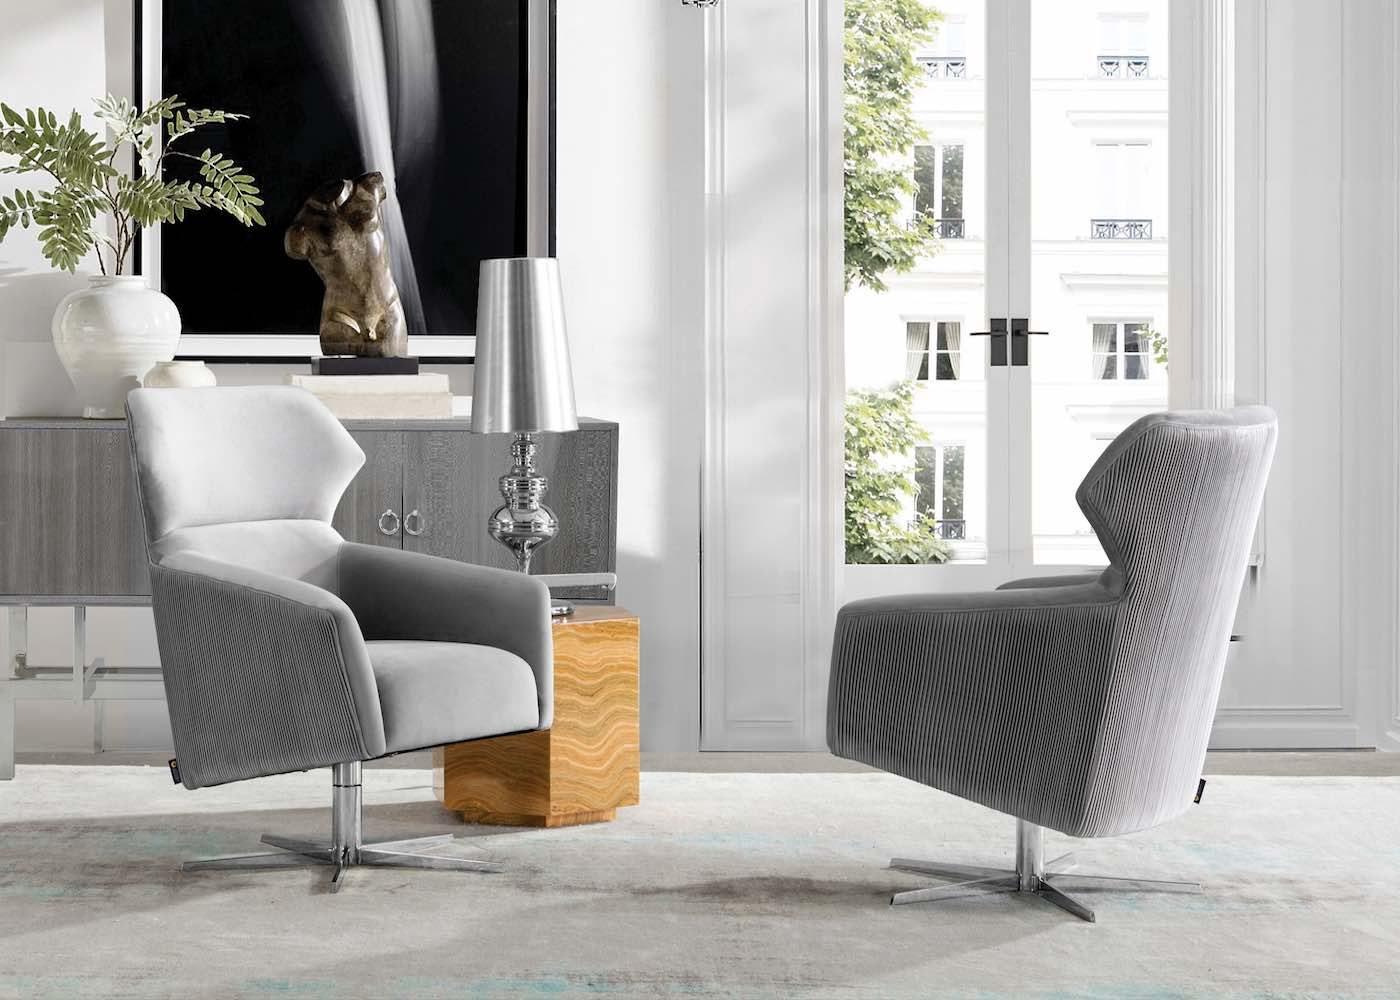 mazarin-ameublement-catalogue-produits-chaise-fauteuil-23